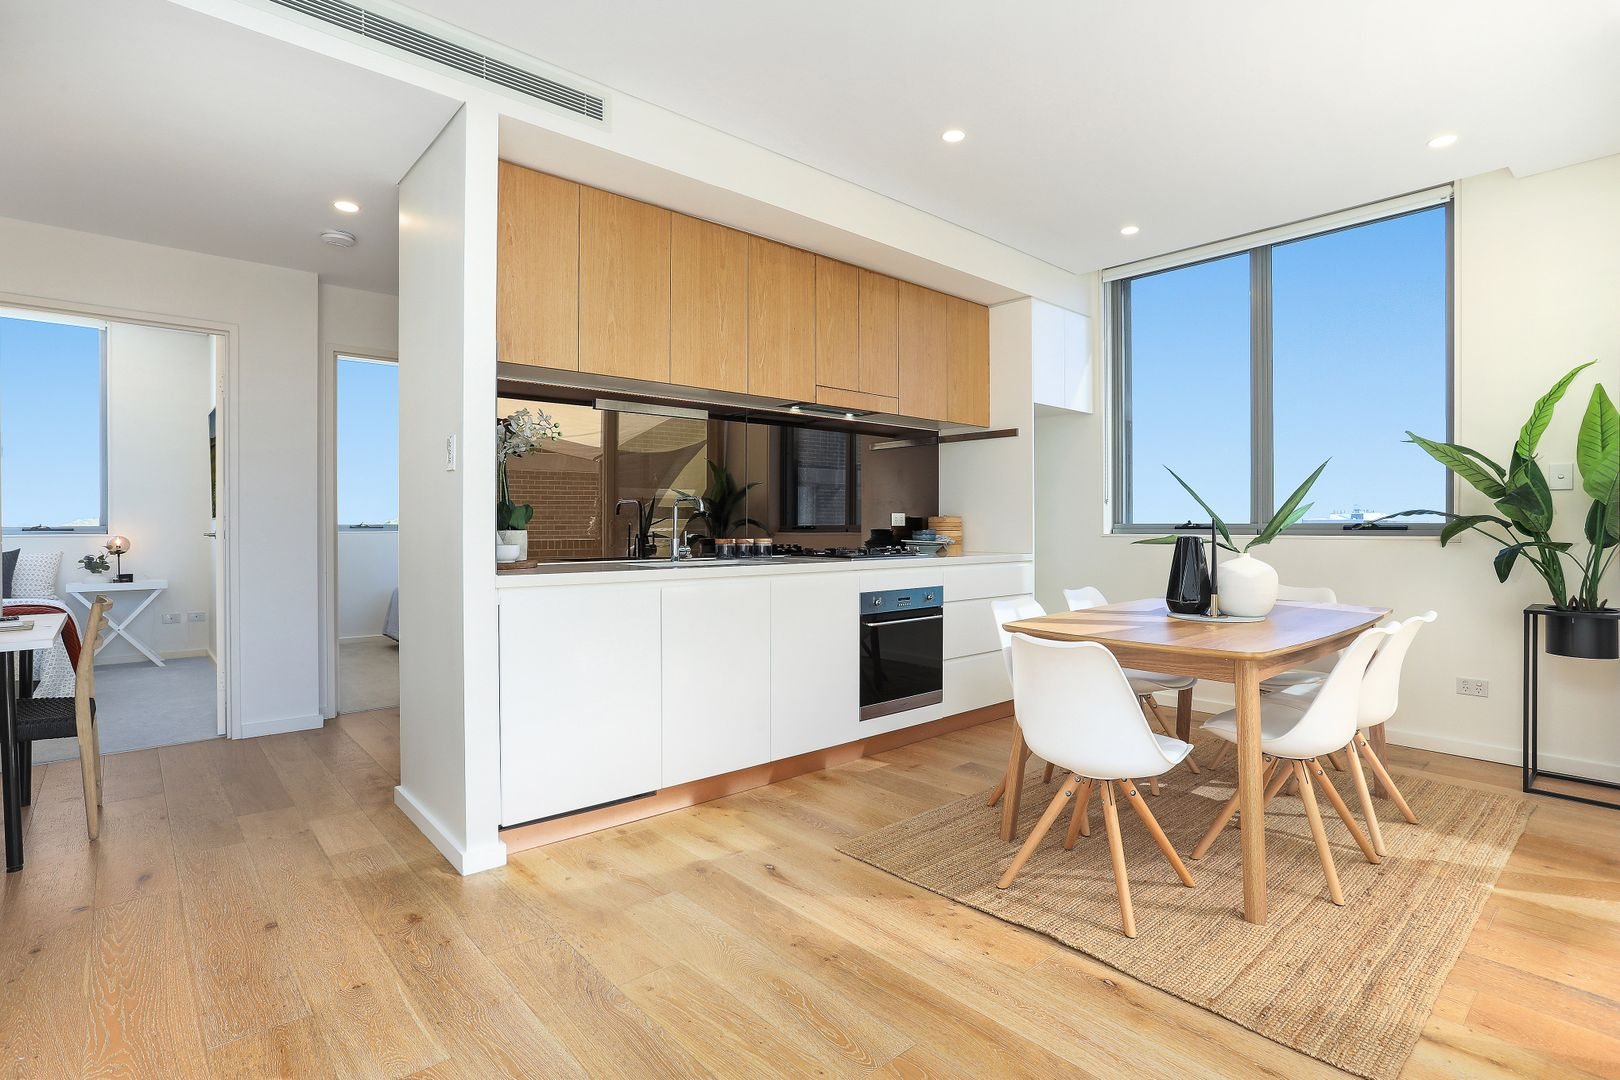 207/23-25 Rosebery Avenue, Rosebery NSW 2018, Image 1